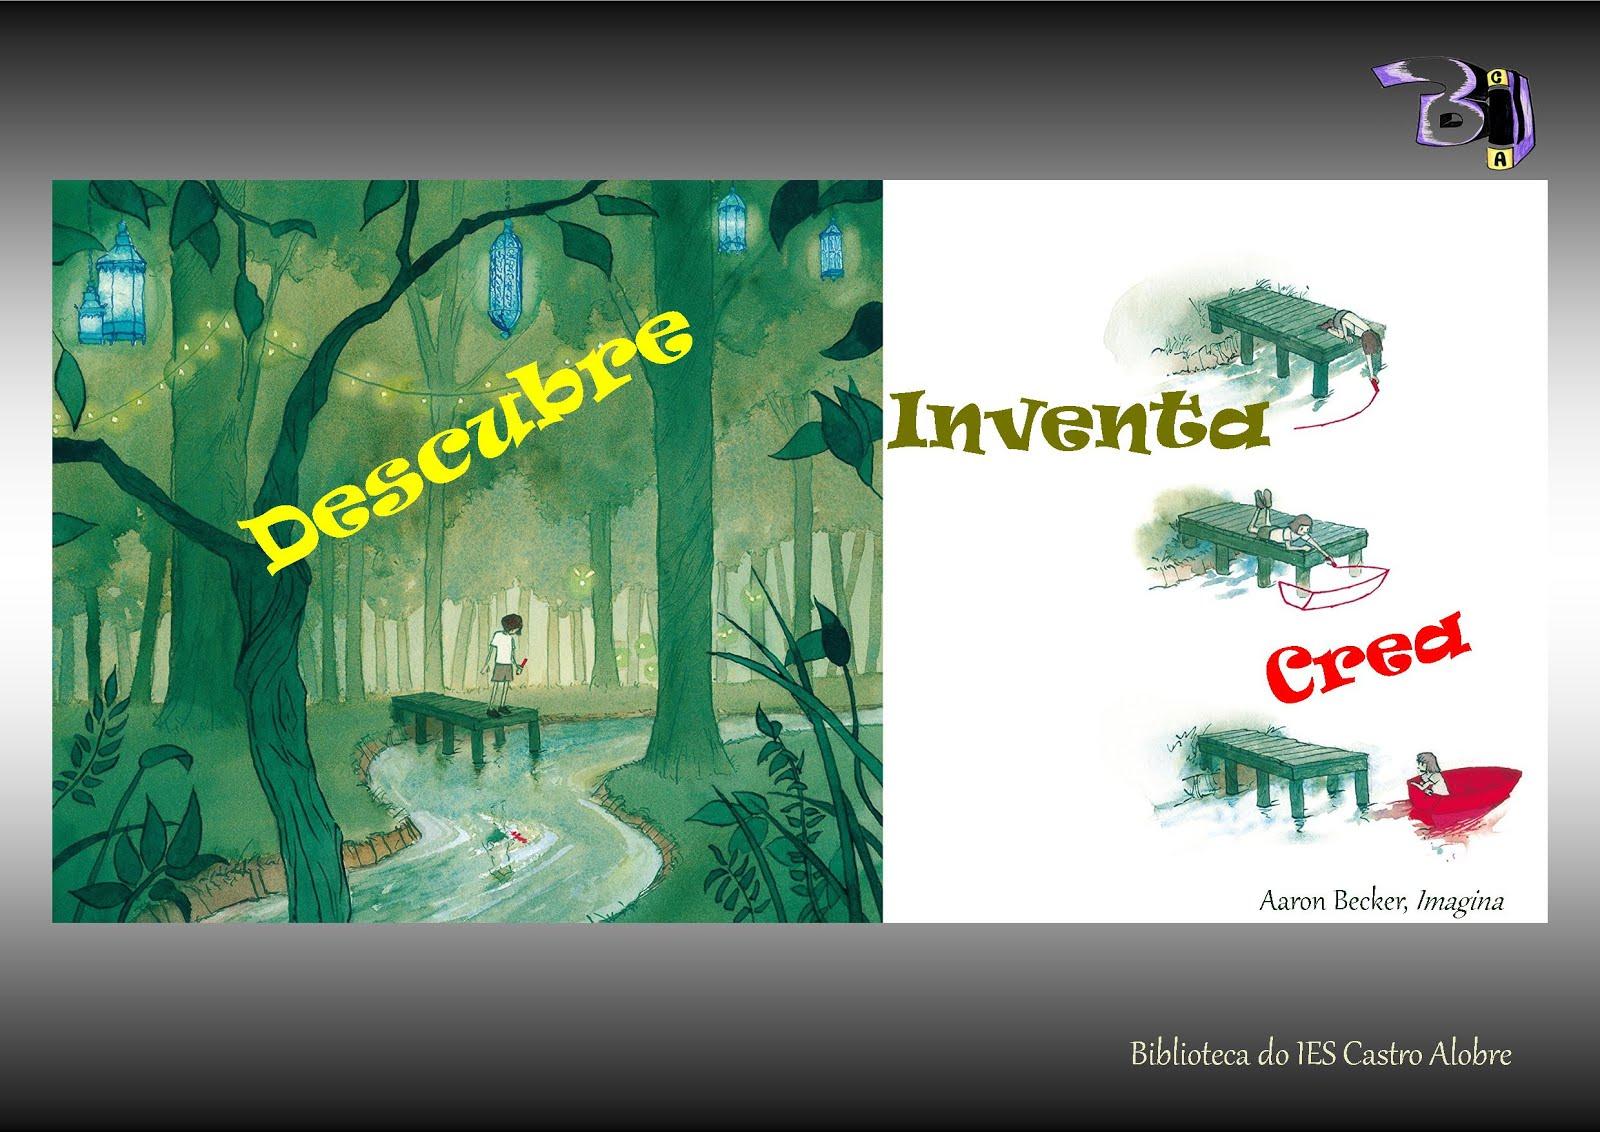 Descubre, Inventa, Crea